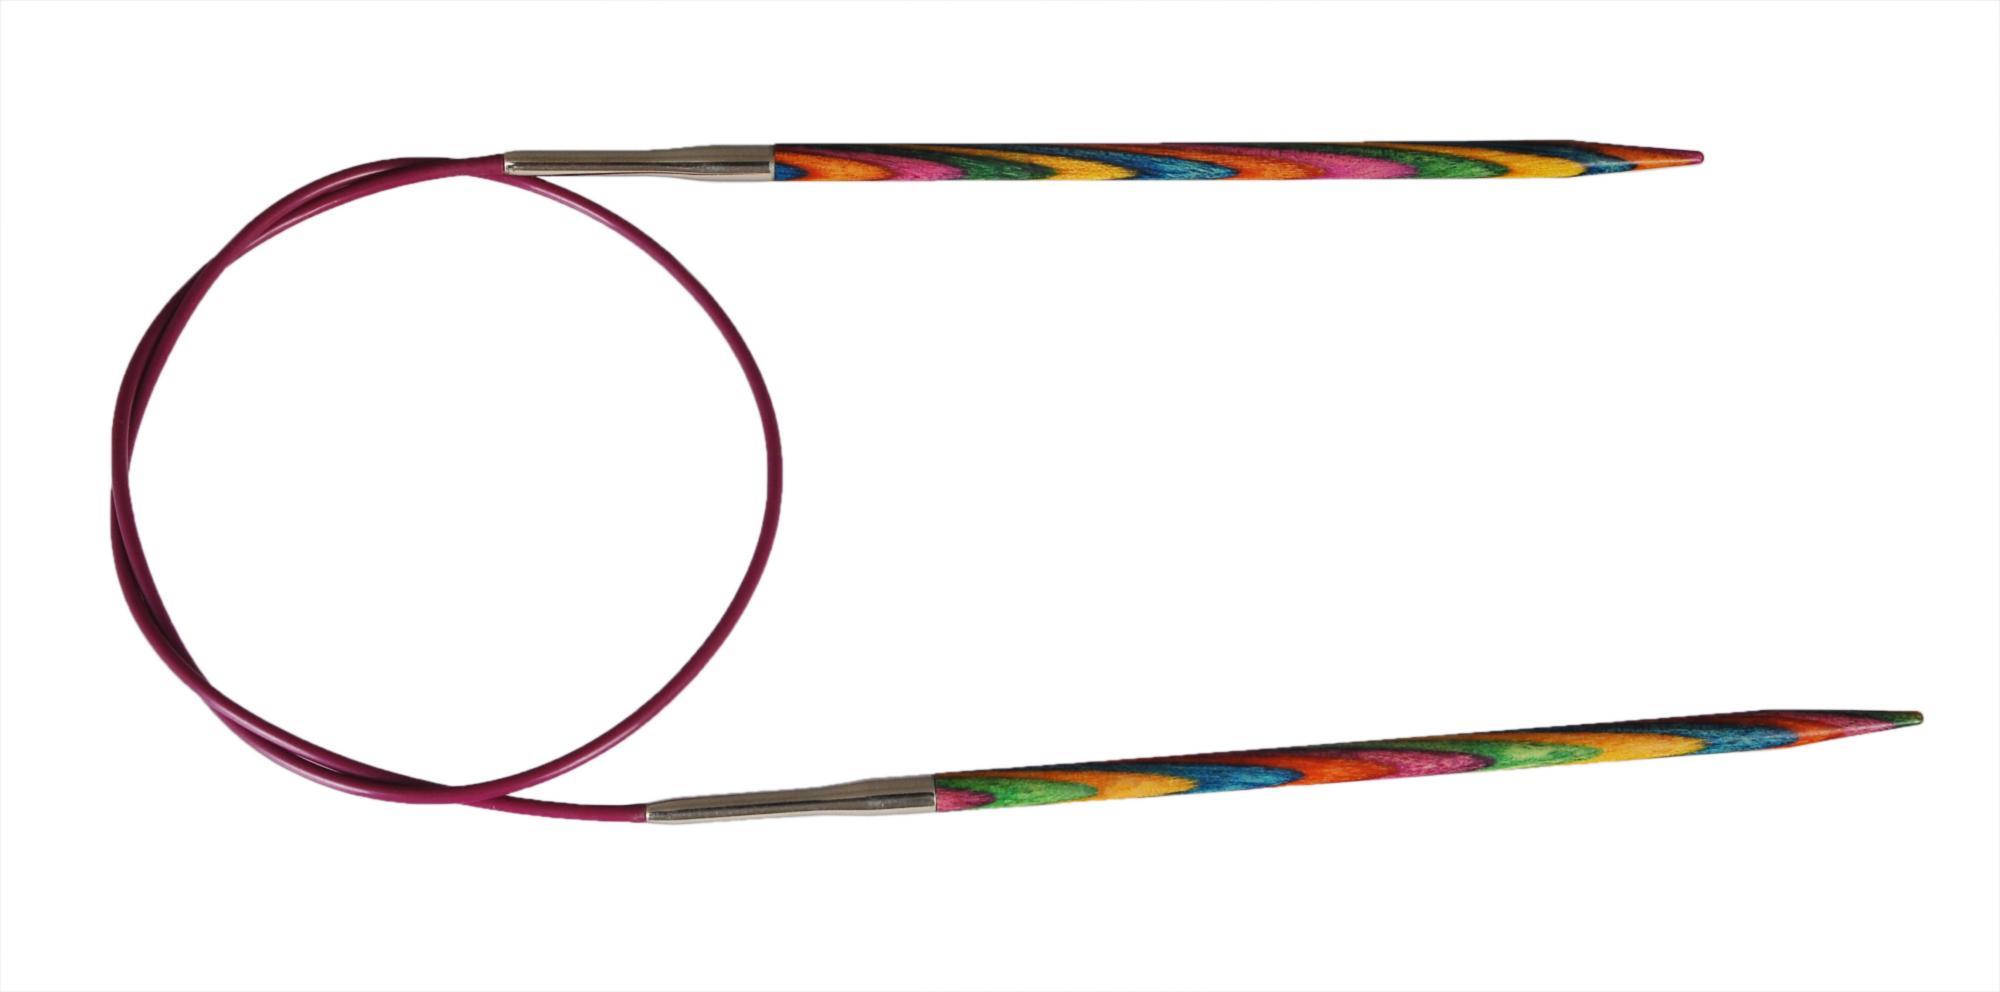 Спицы круговые 150 см Symfonie Wood KnitPro, 21392, 12.00 мм